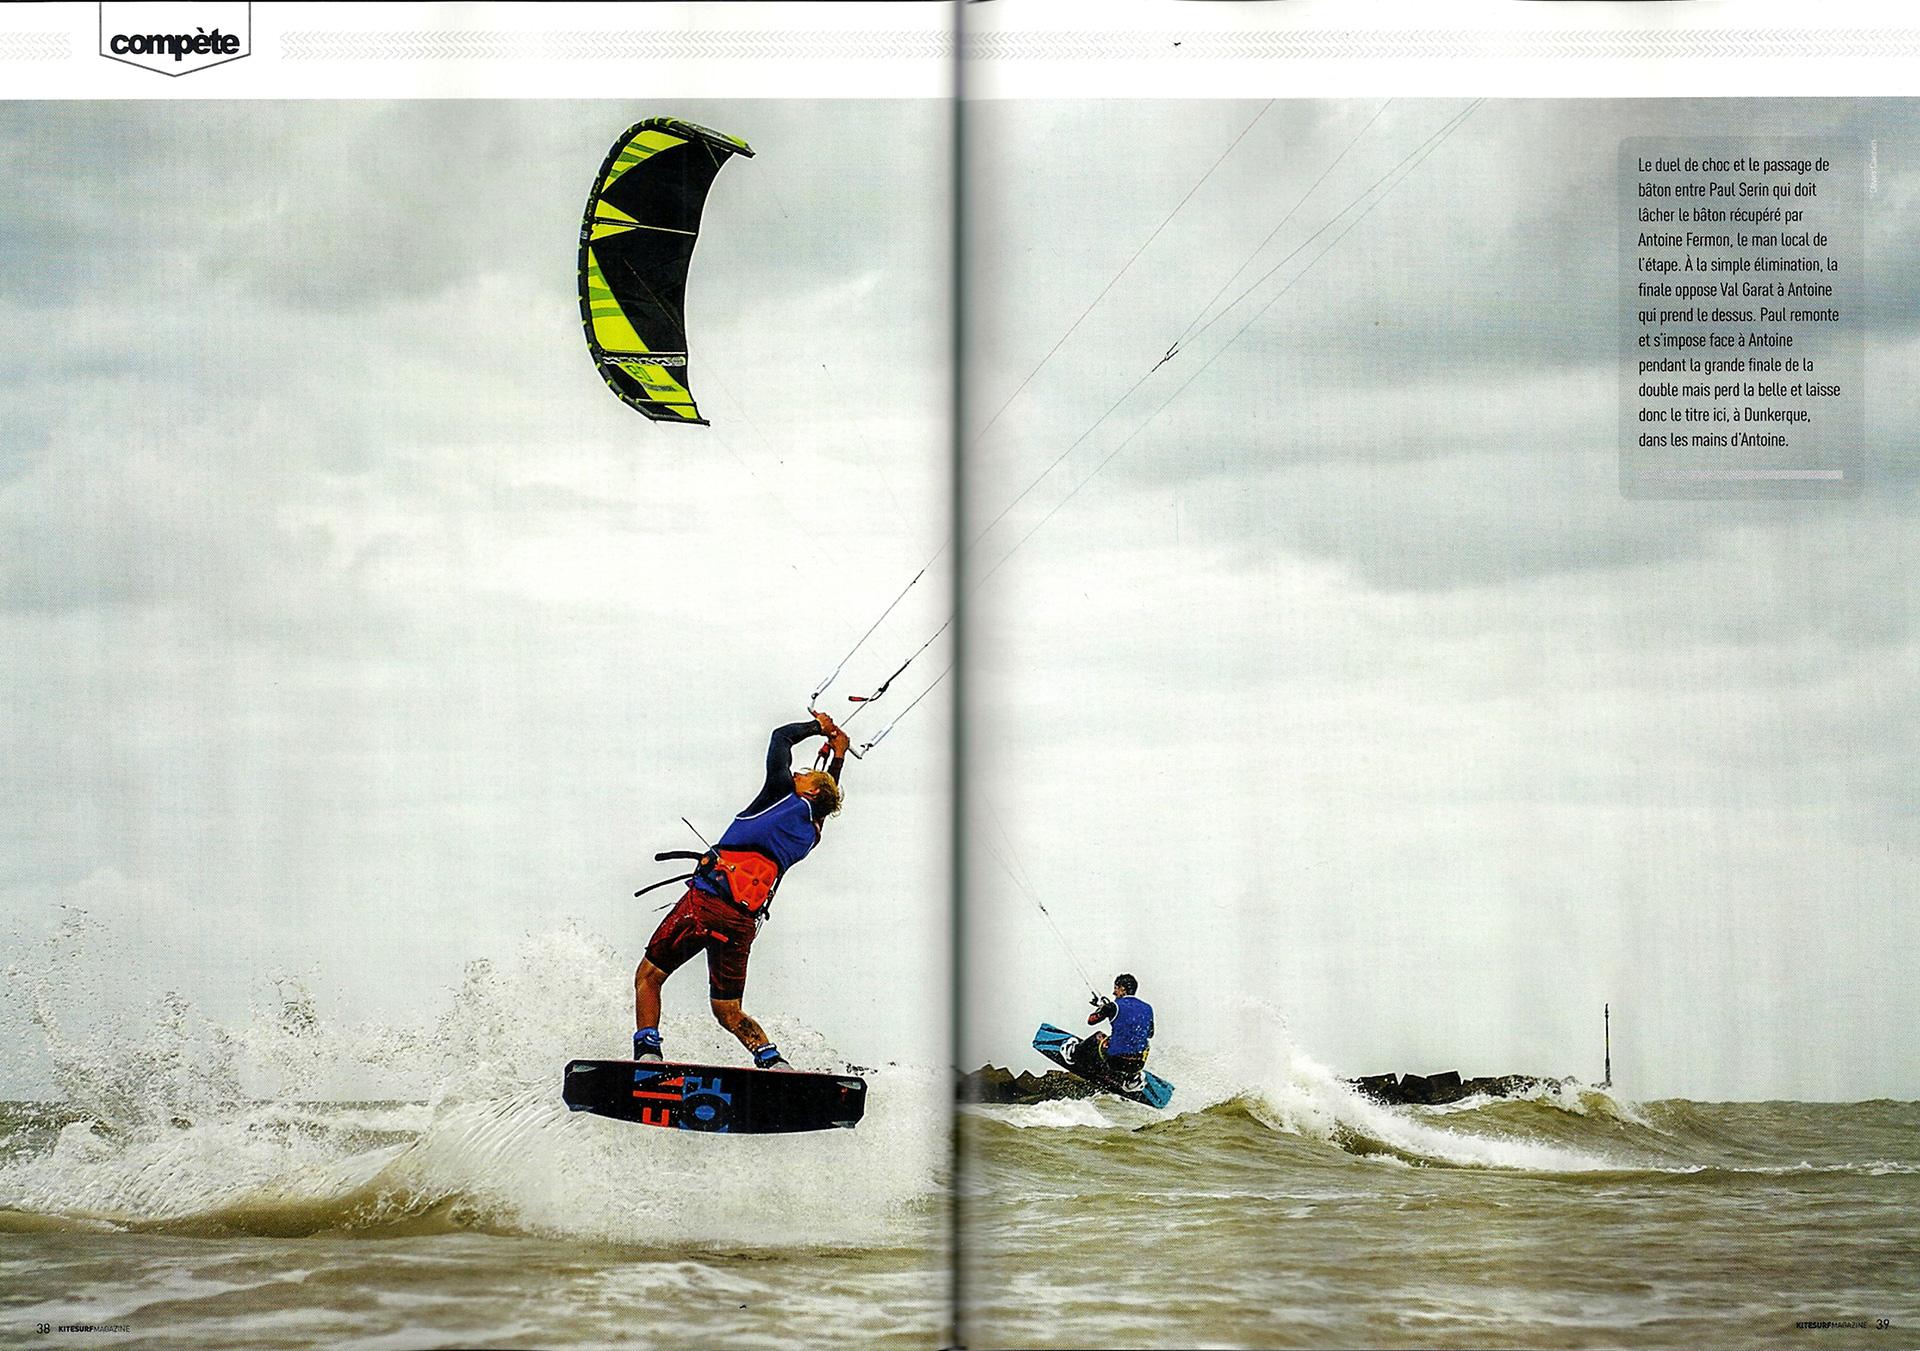 KitesurfMagOctobre2015-P2